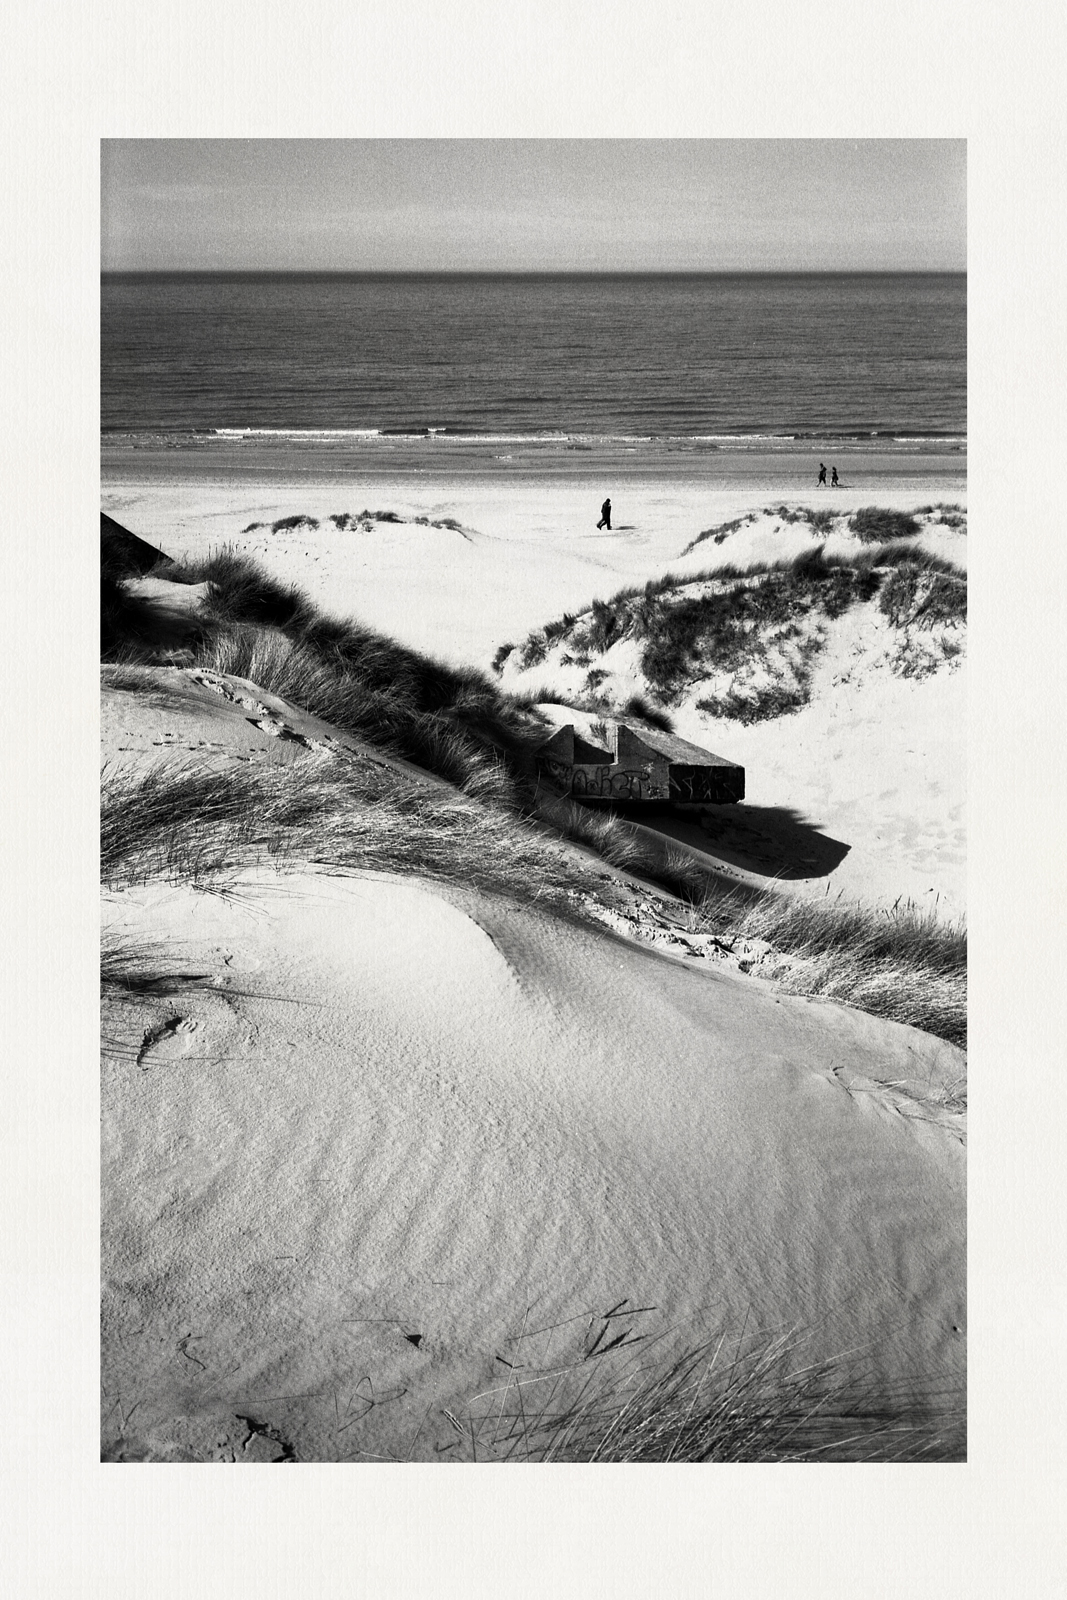 photographies du Nord 183 tirage mat